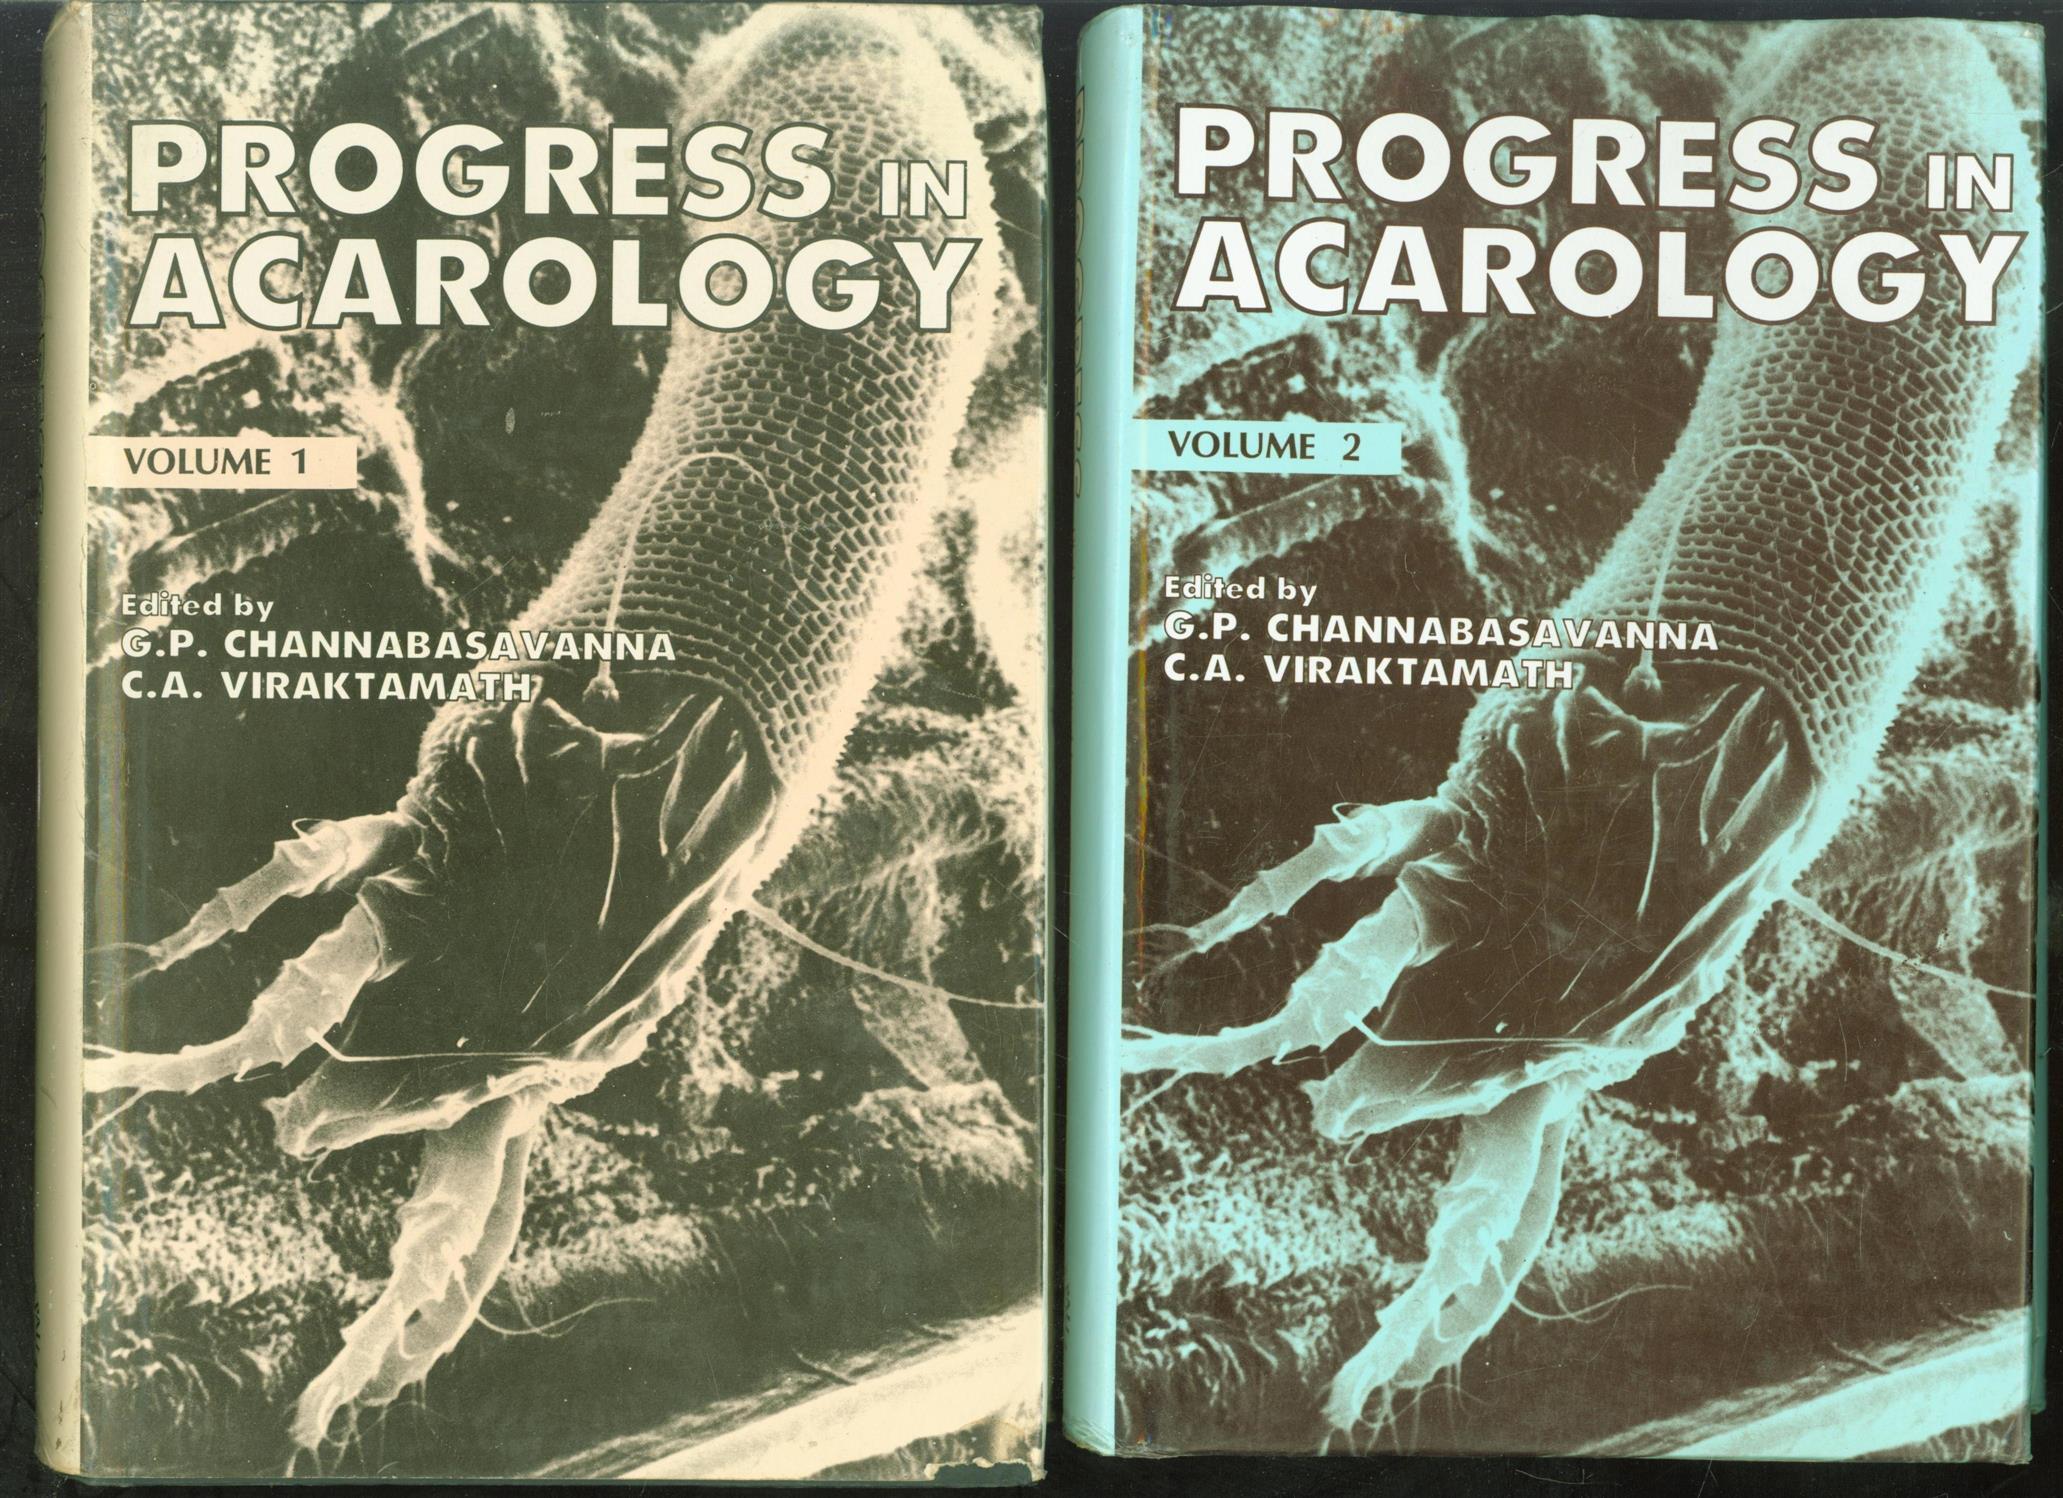 G P CHANNABASAVANNA, C A VIRAKTAMATH, INTERNATIONAL CONGRESS OF ACAROLOGY (7TH: 1986: BANGALORE, INDIA) - Progress in acarology ( vol I + II )